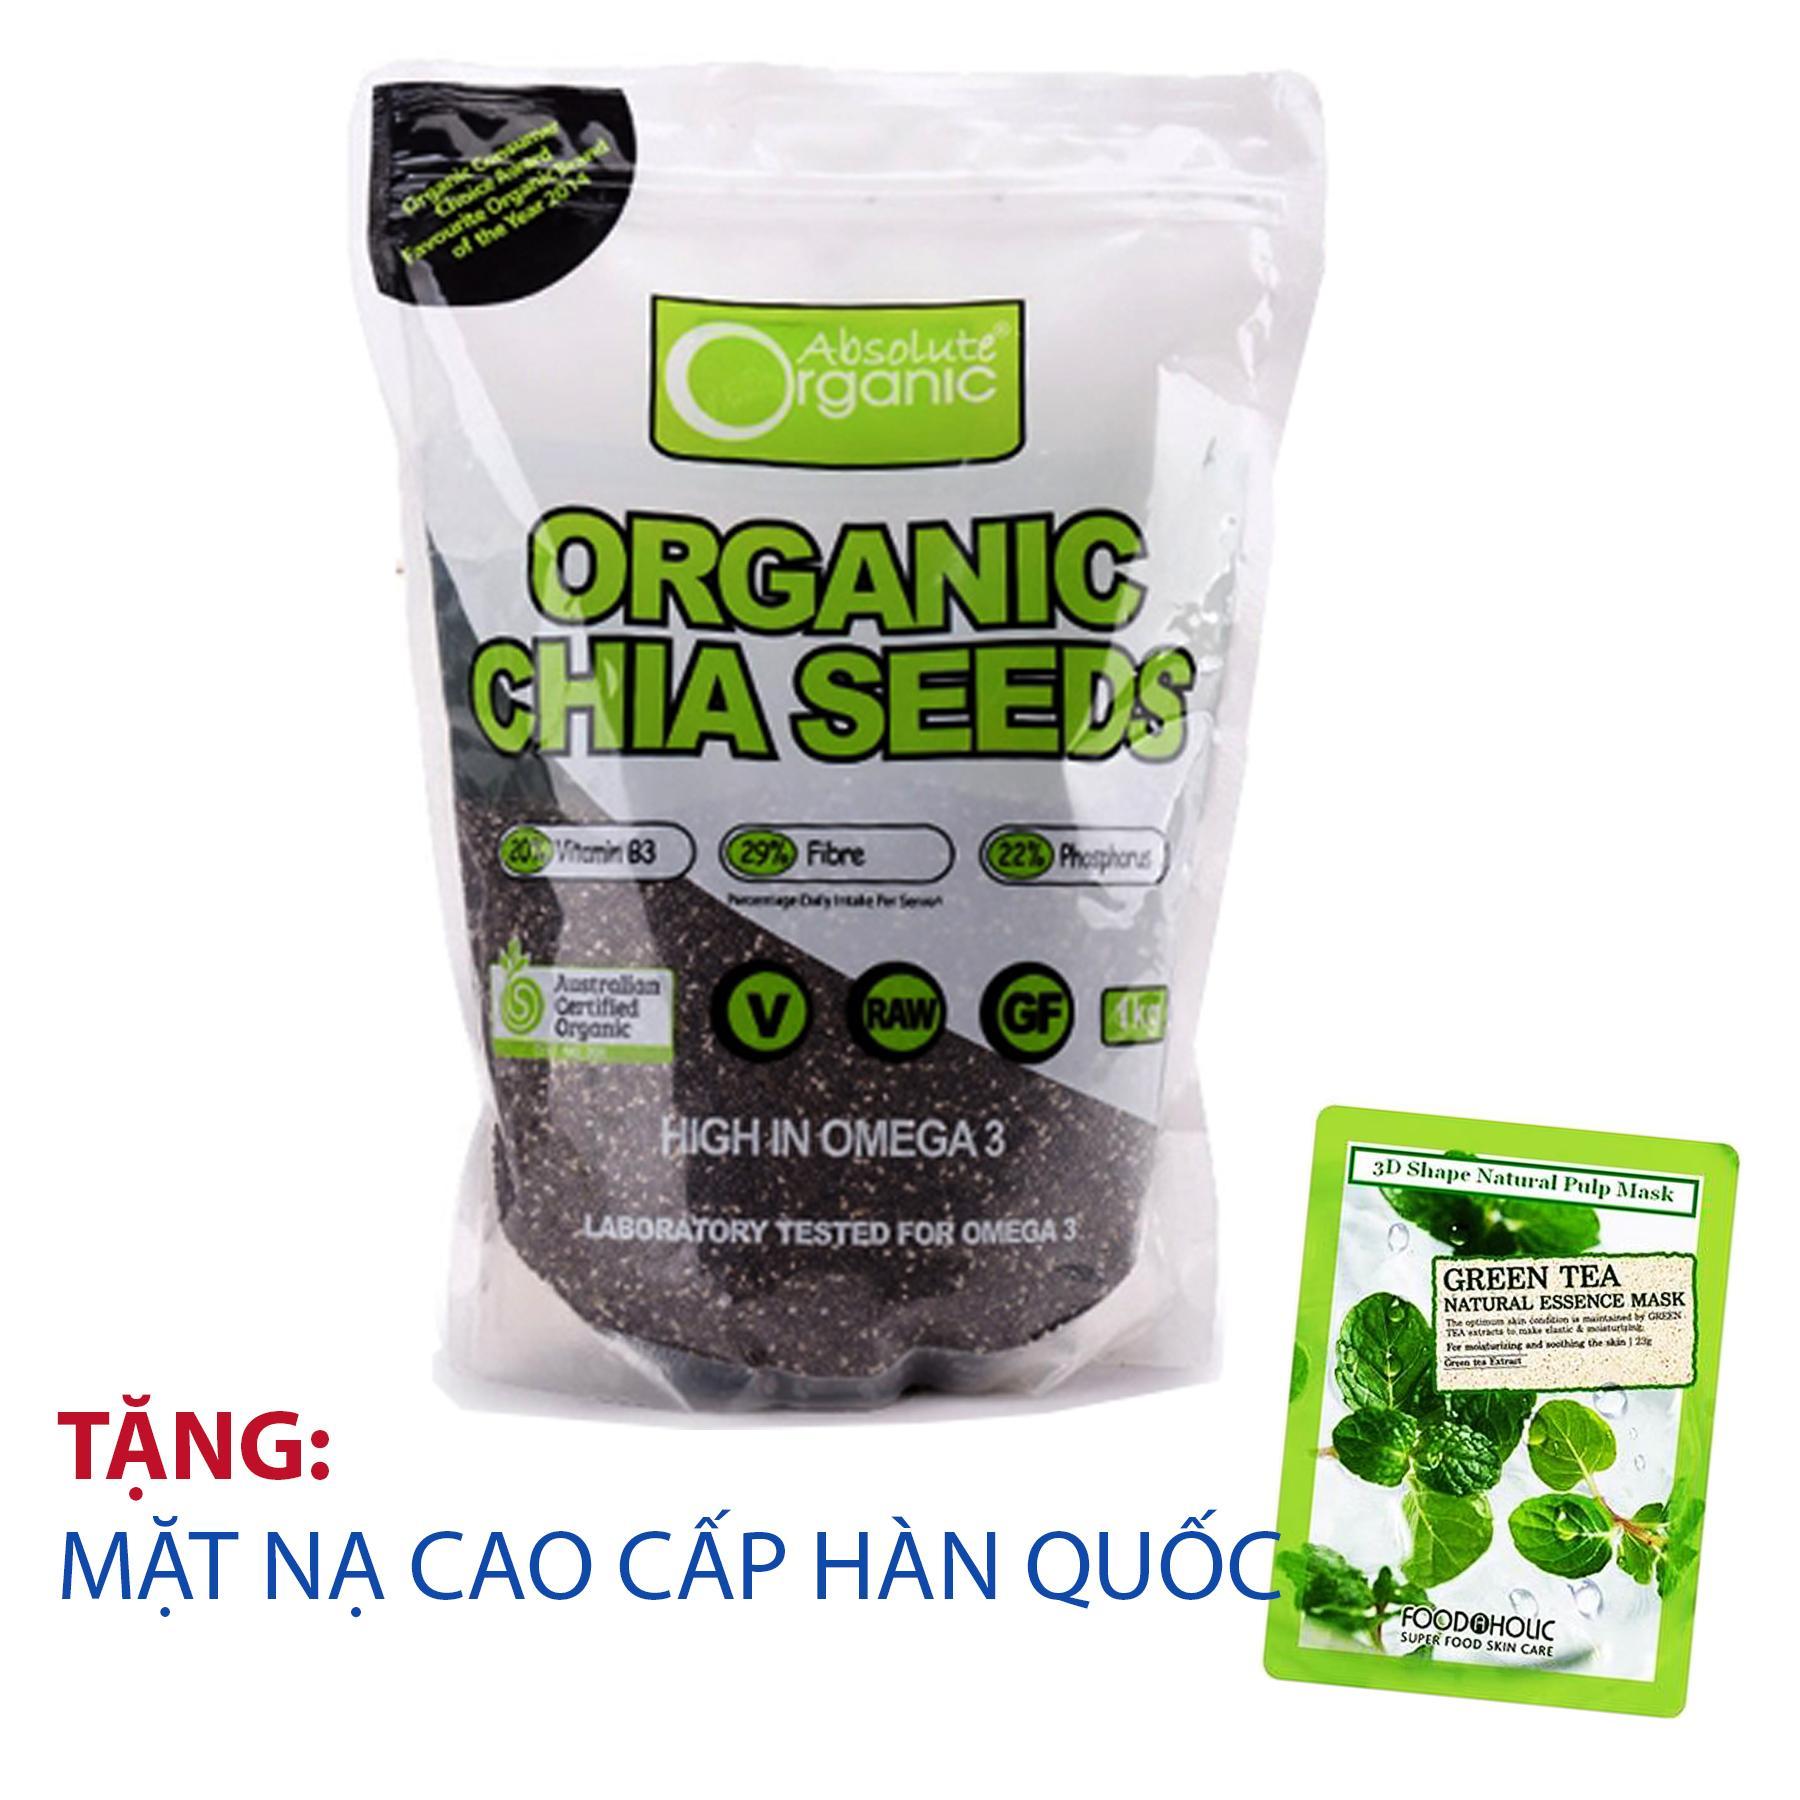 Hạt Chia Uc Seeds High In Omega 3 Absolute Organic Organic Chiết Khấu 40